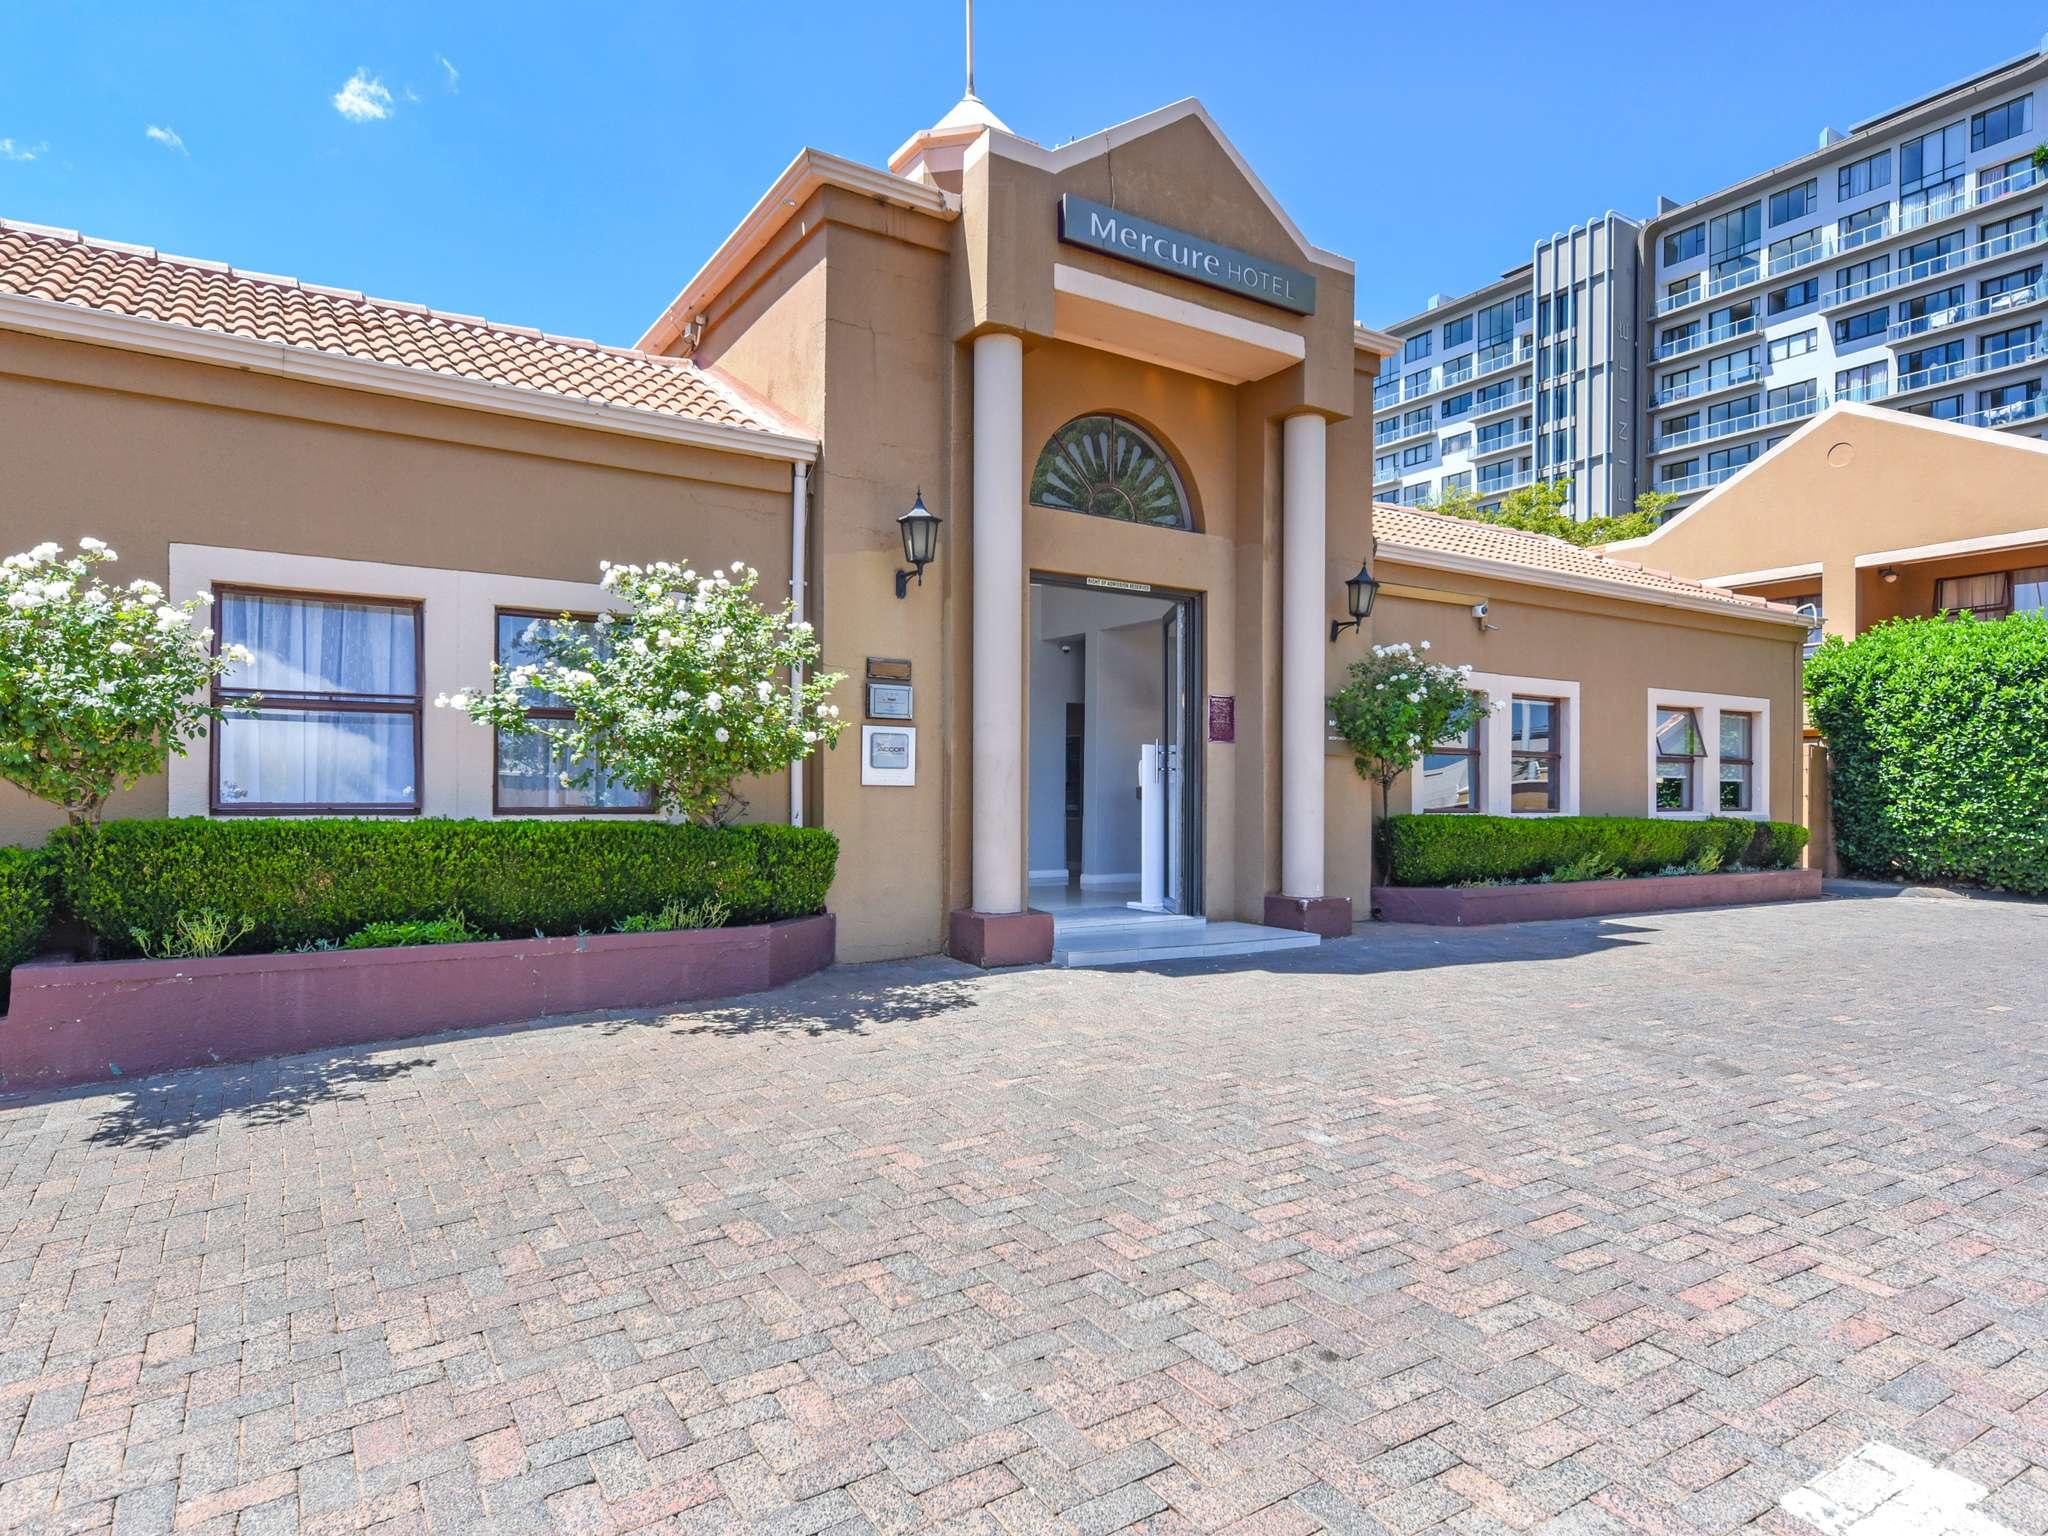 Hotell – Mercure Johannesburg Bedfordview Hotel